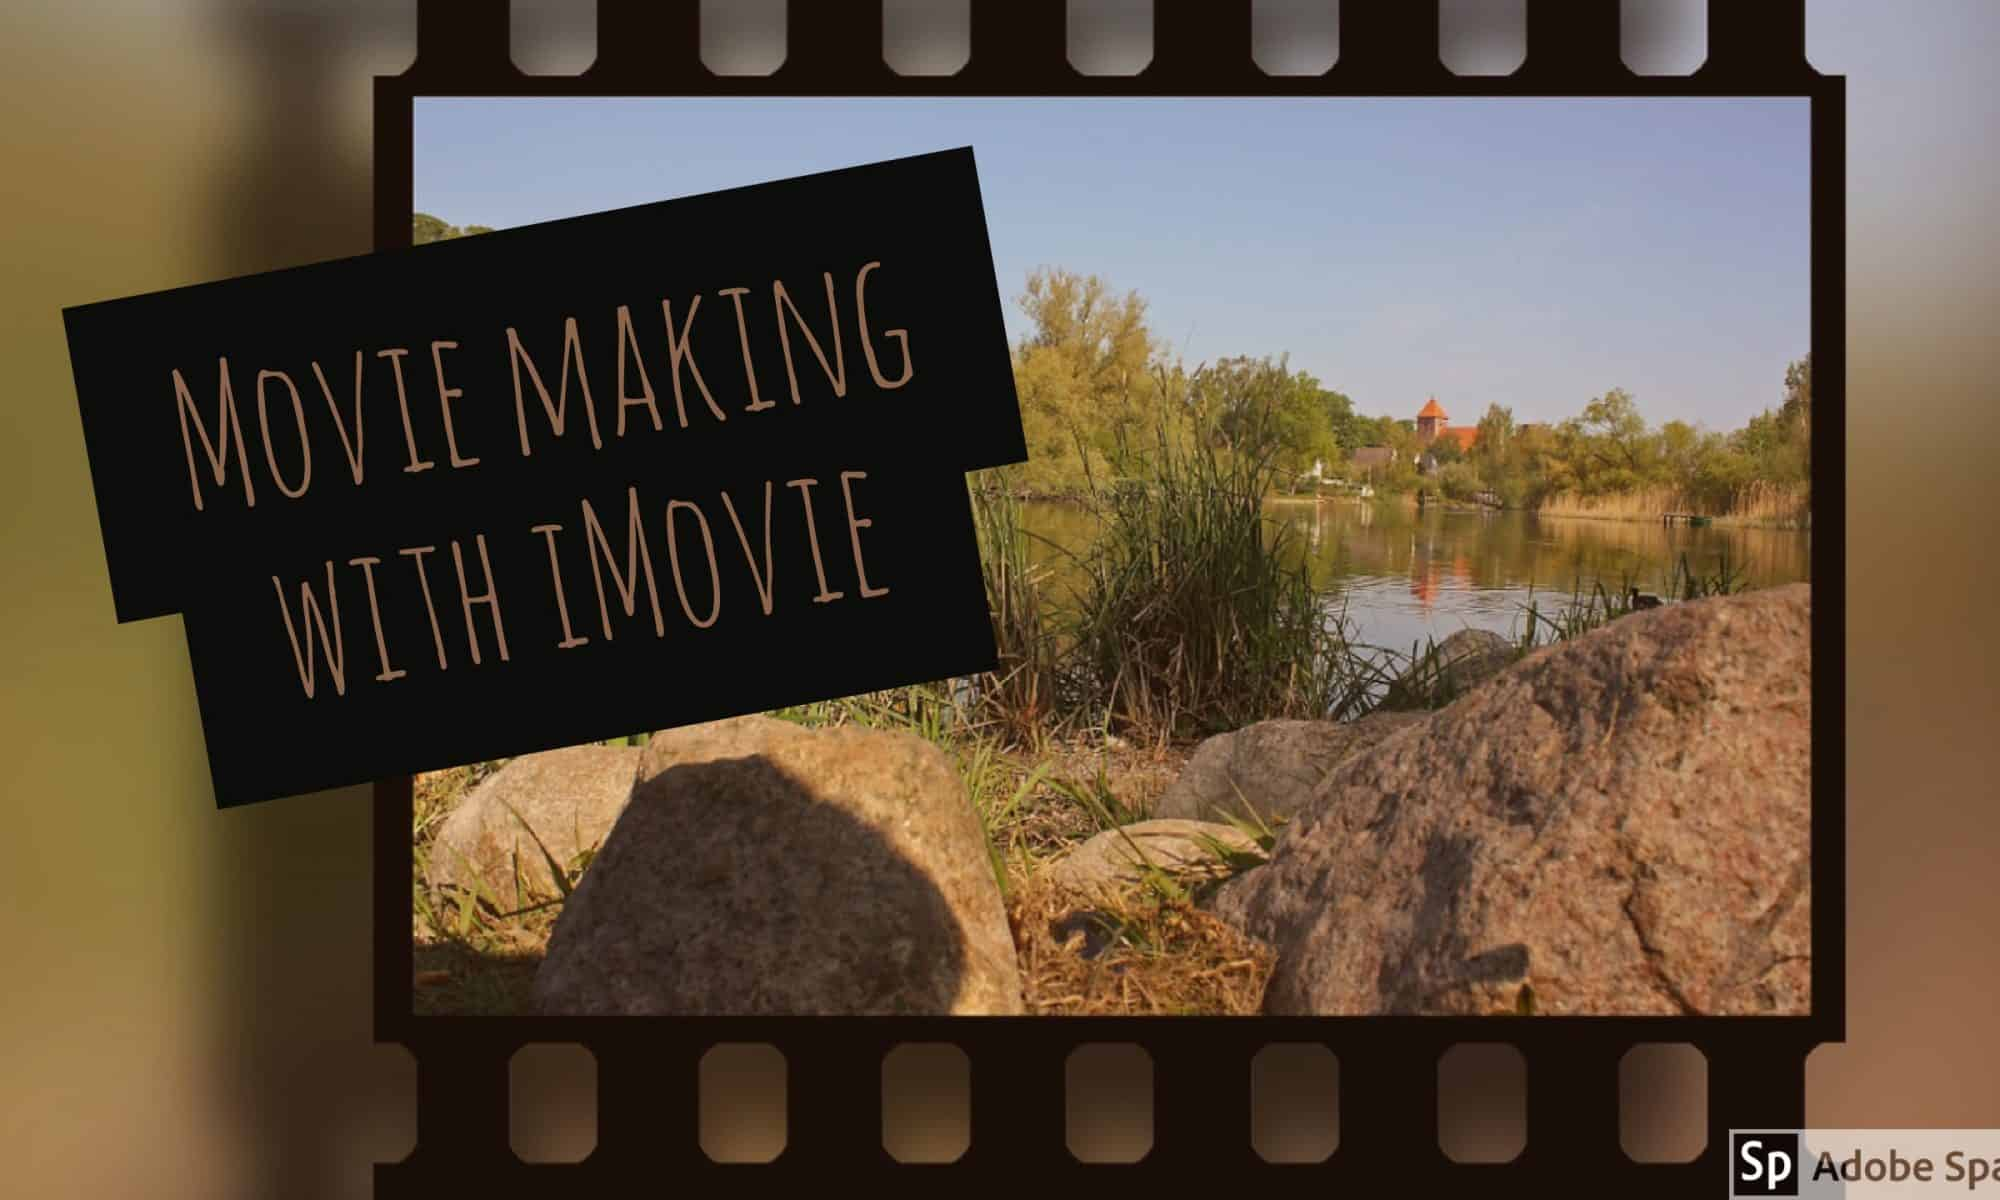 Movie Making with iMovie